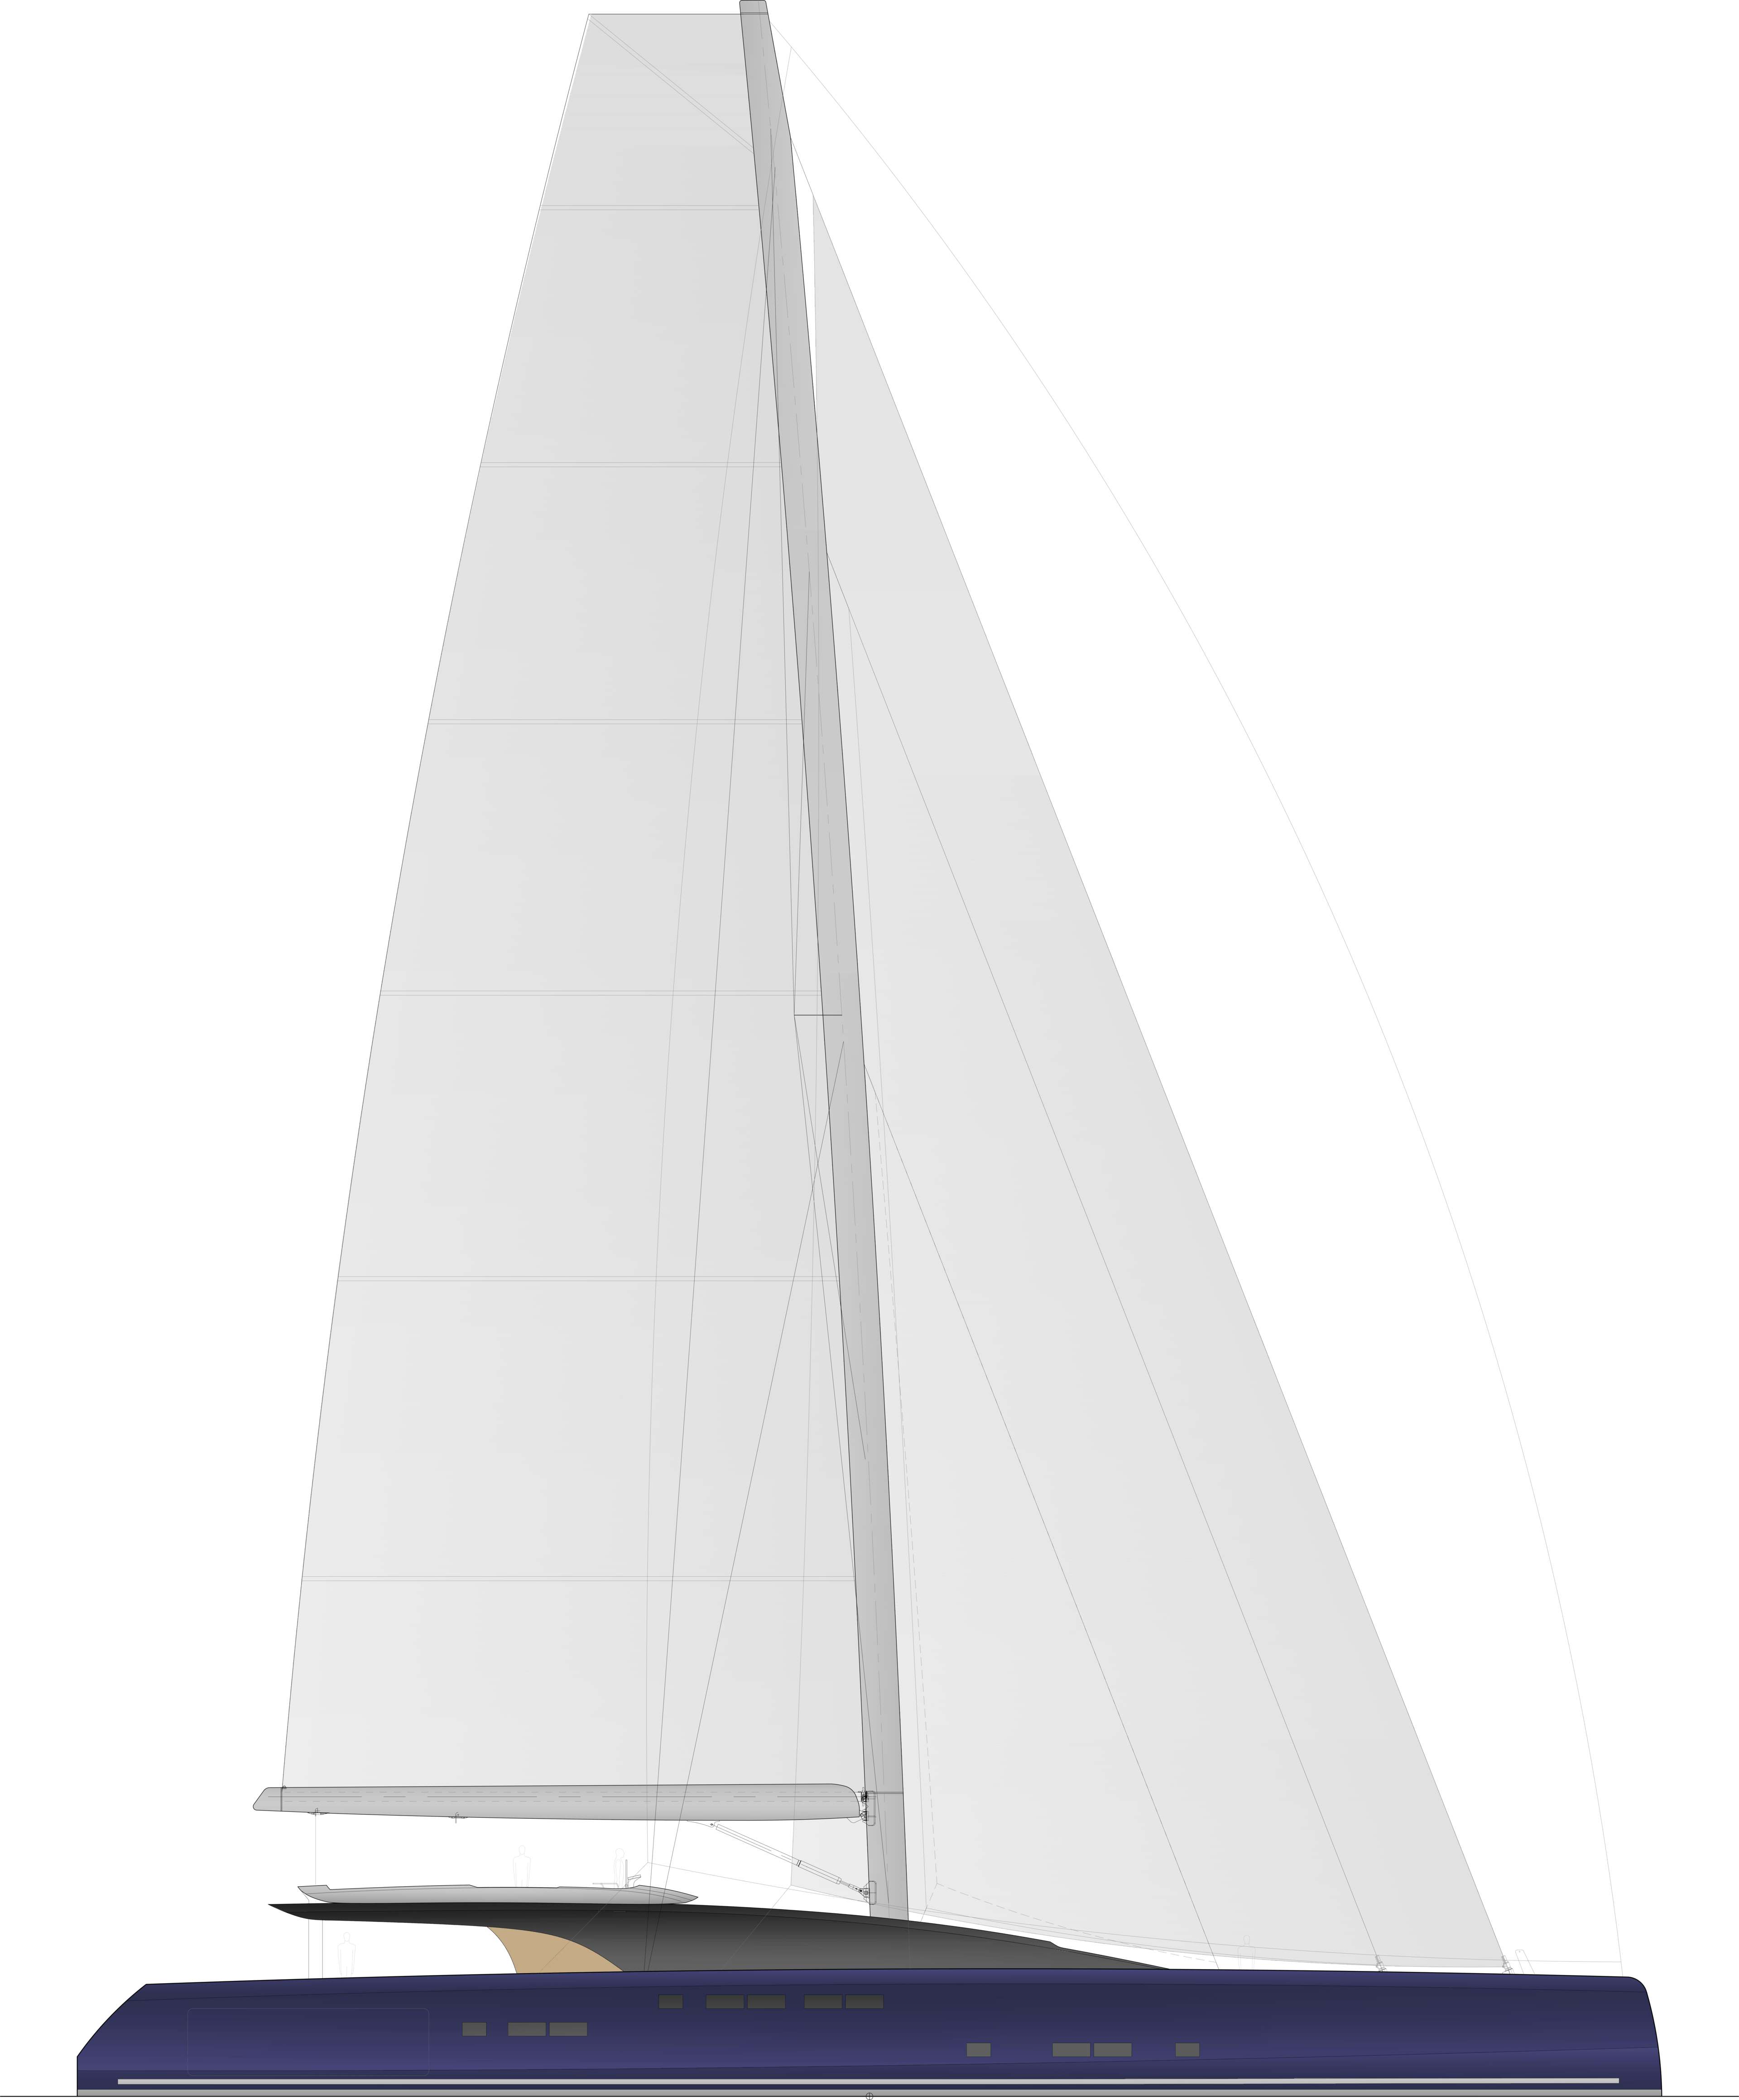 MMYD_062_46m Cat_Sail Plan 2_publicity.png